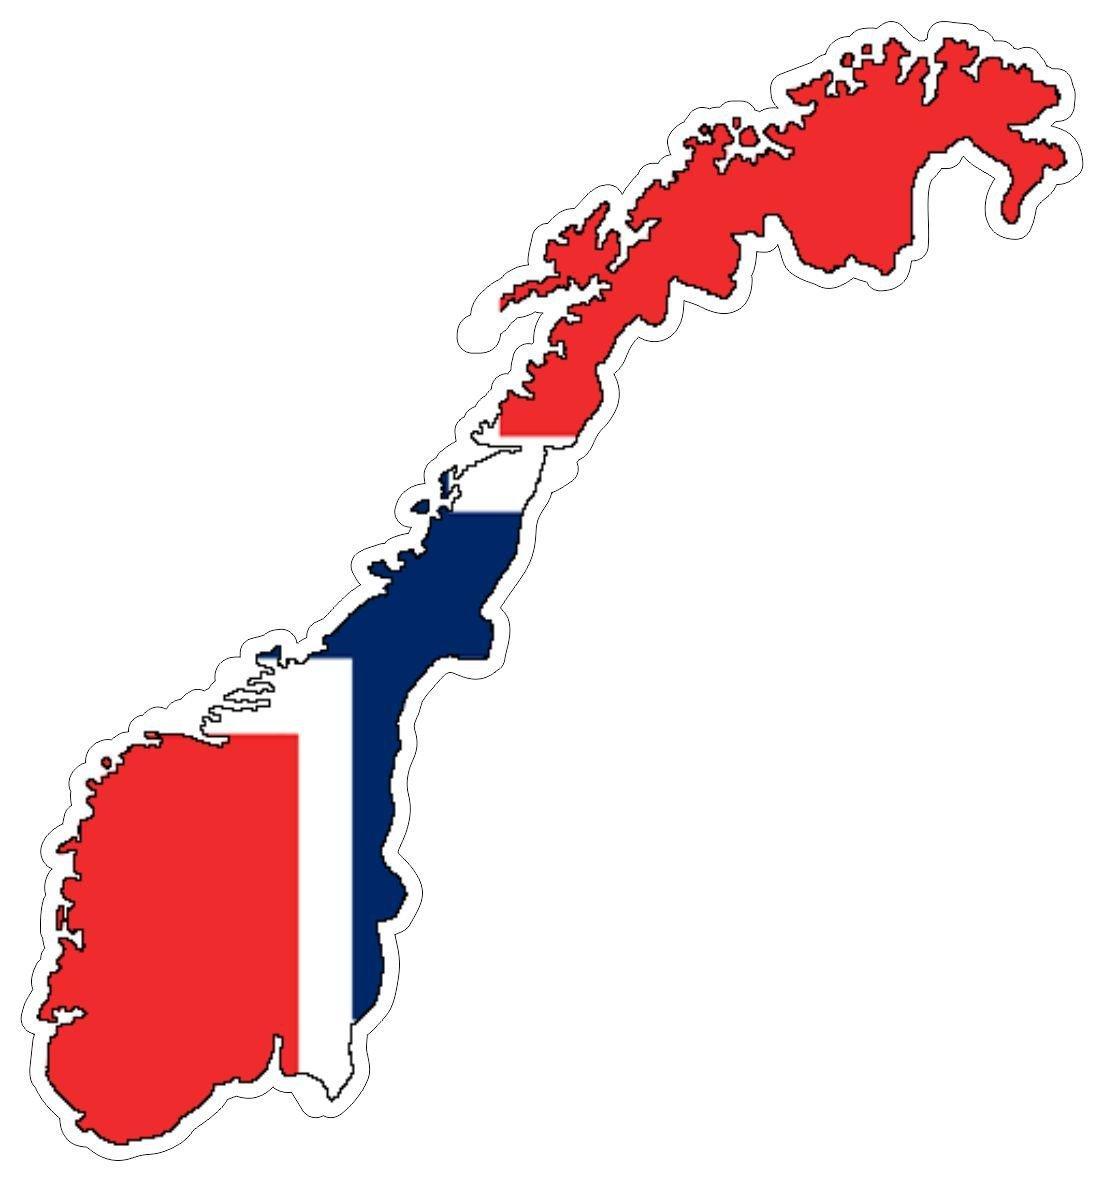 Autocollant sticker adhesif voiture vinyle drapeau carte norvege